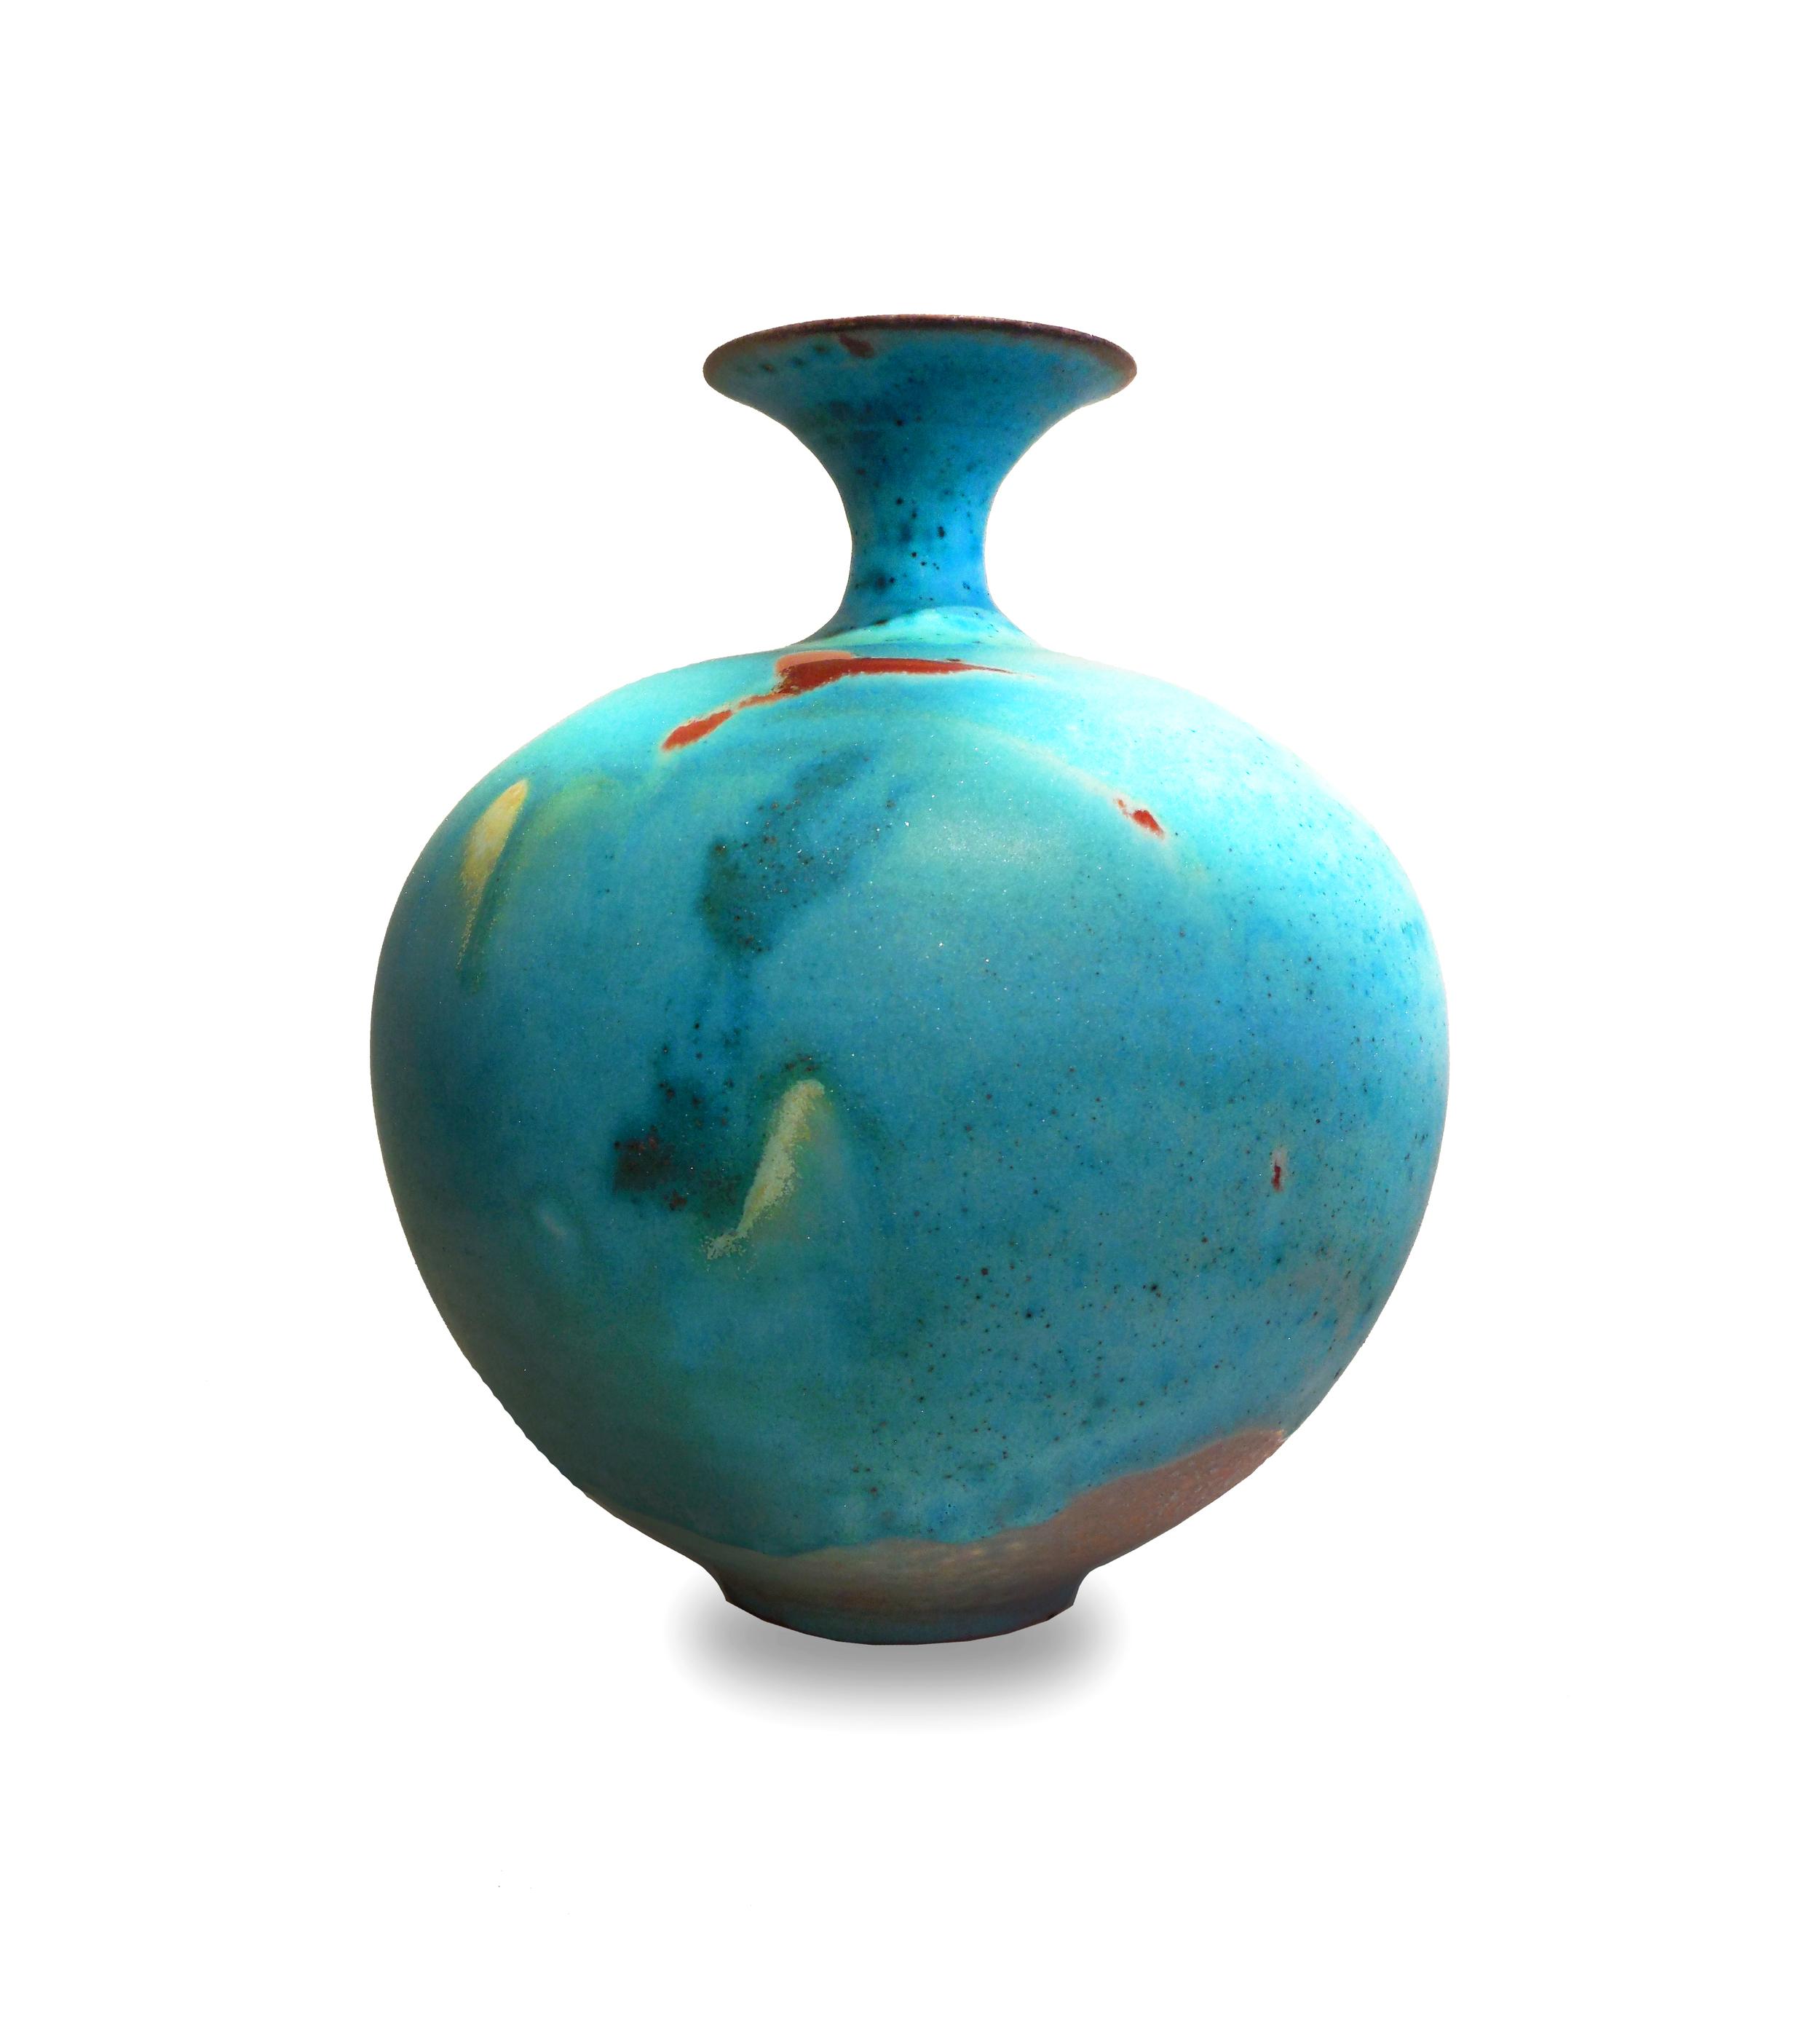 SOLD II Turquoise vase by Kayo O'Young